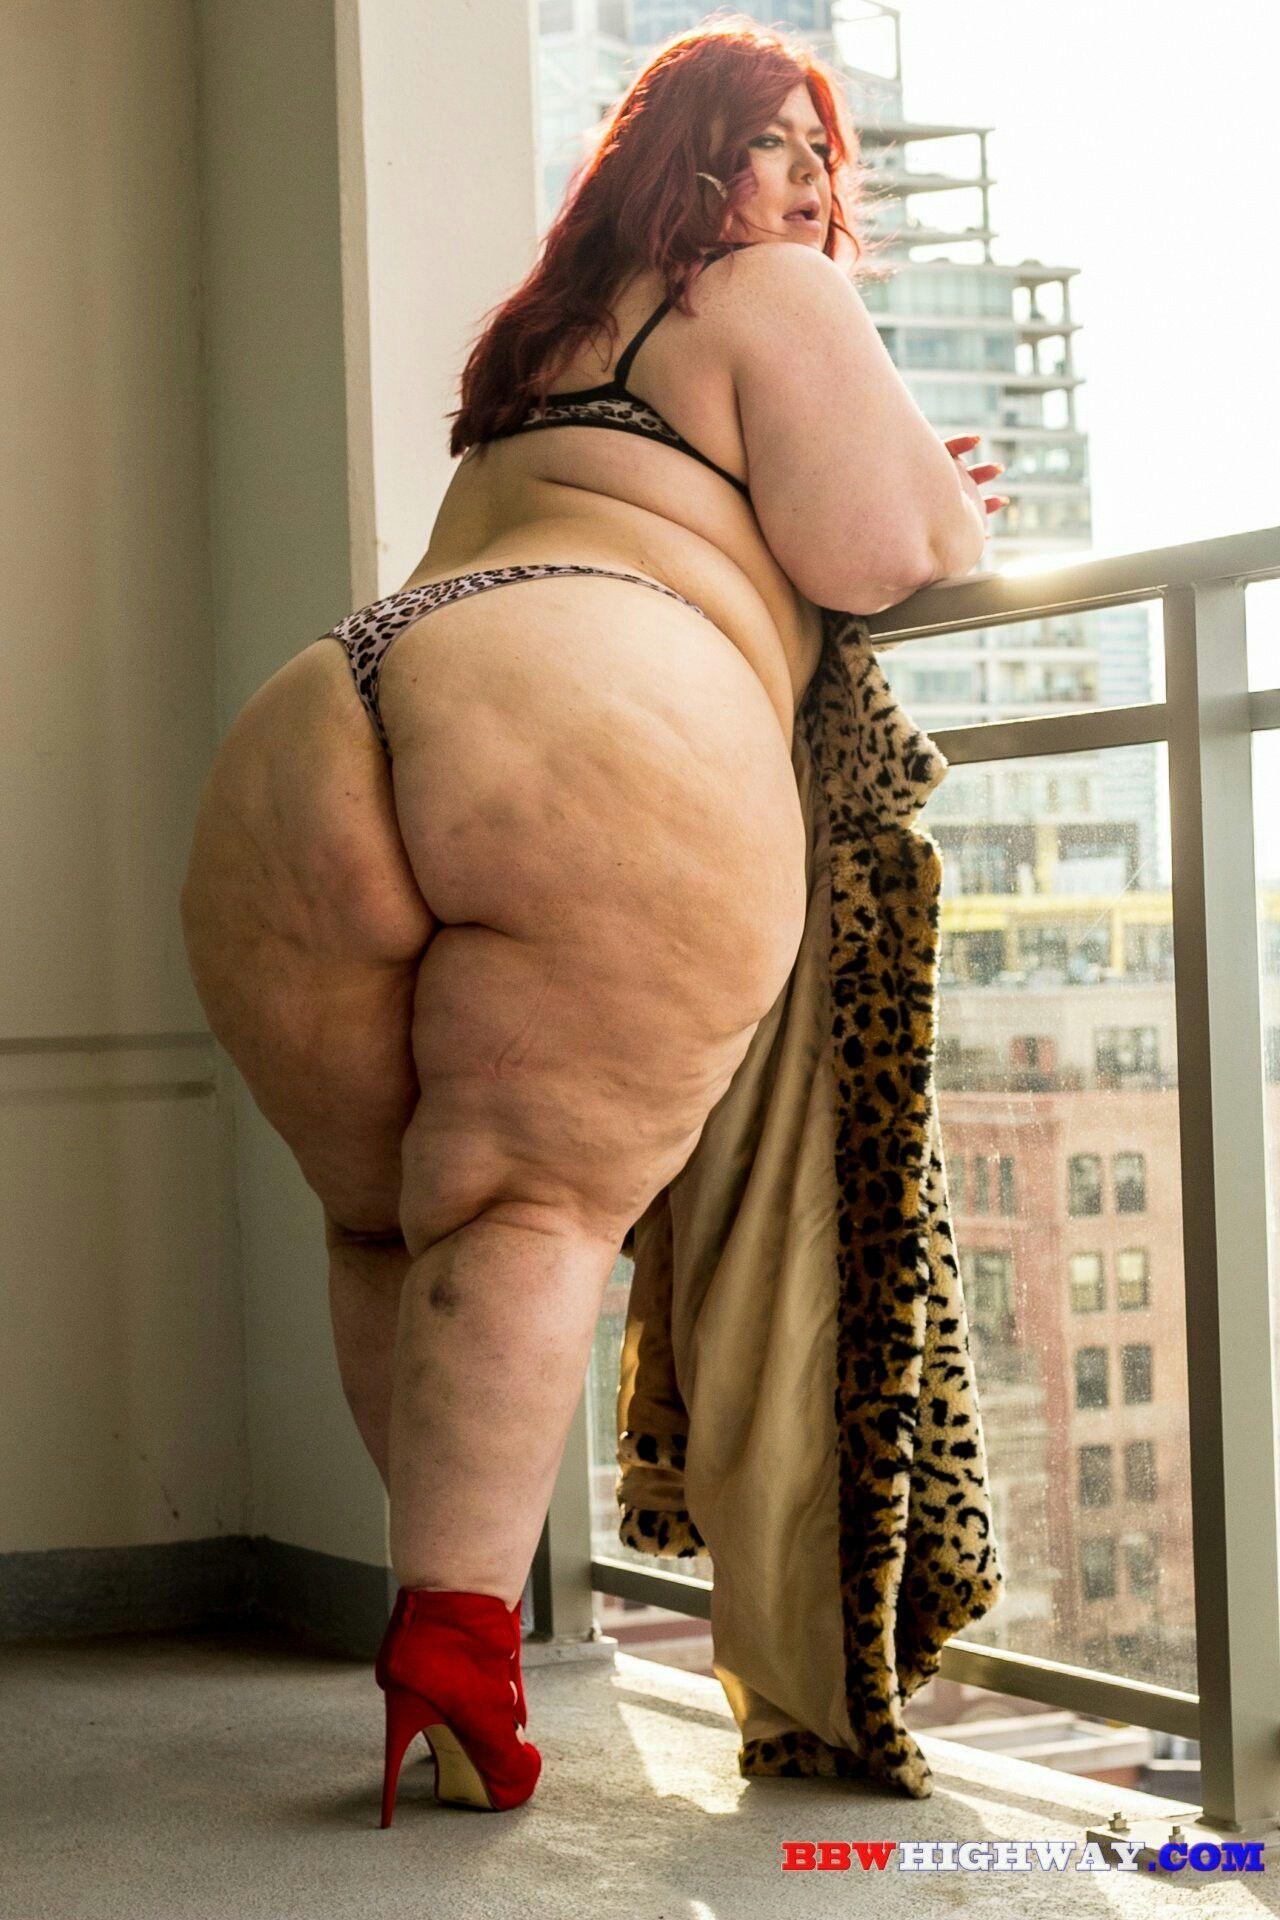 Girls World Plus Size Girls Ssbbw Big Woman Curves Lady